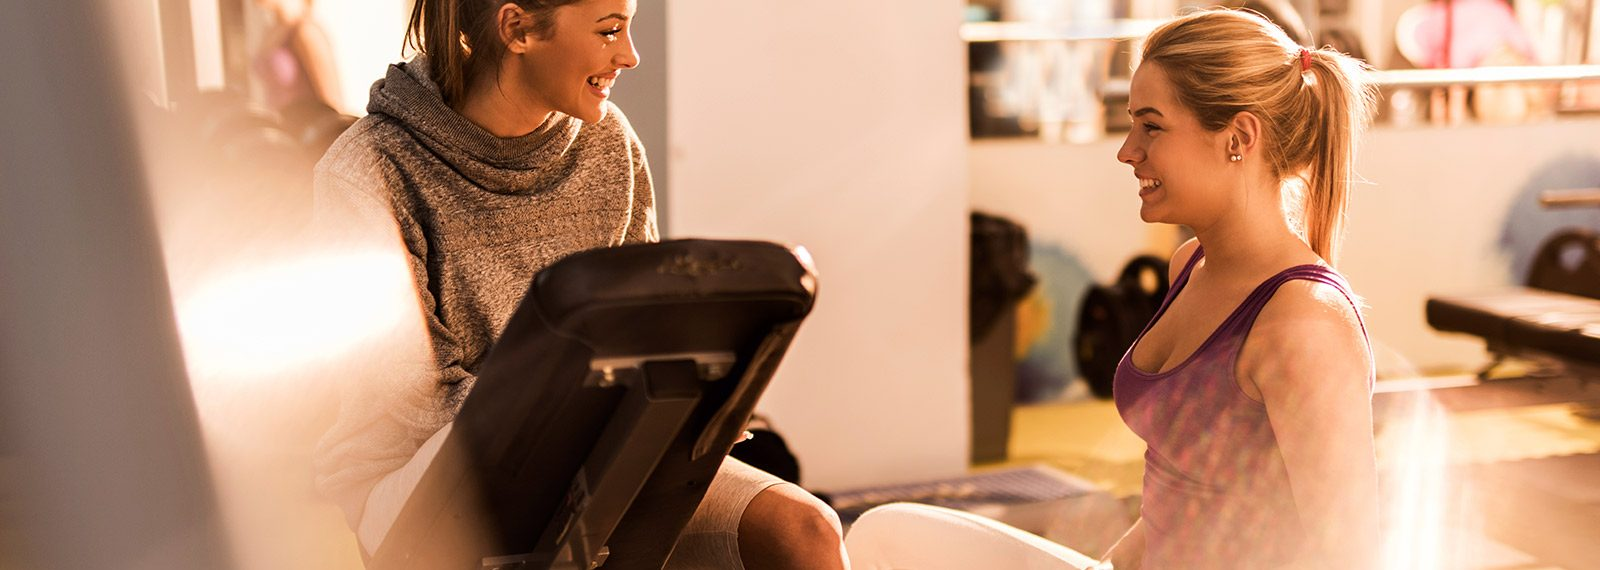 Freundinnen im Fitnessstudio plaudern